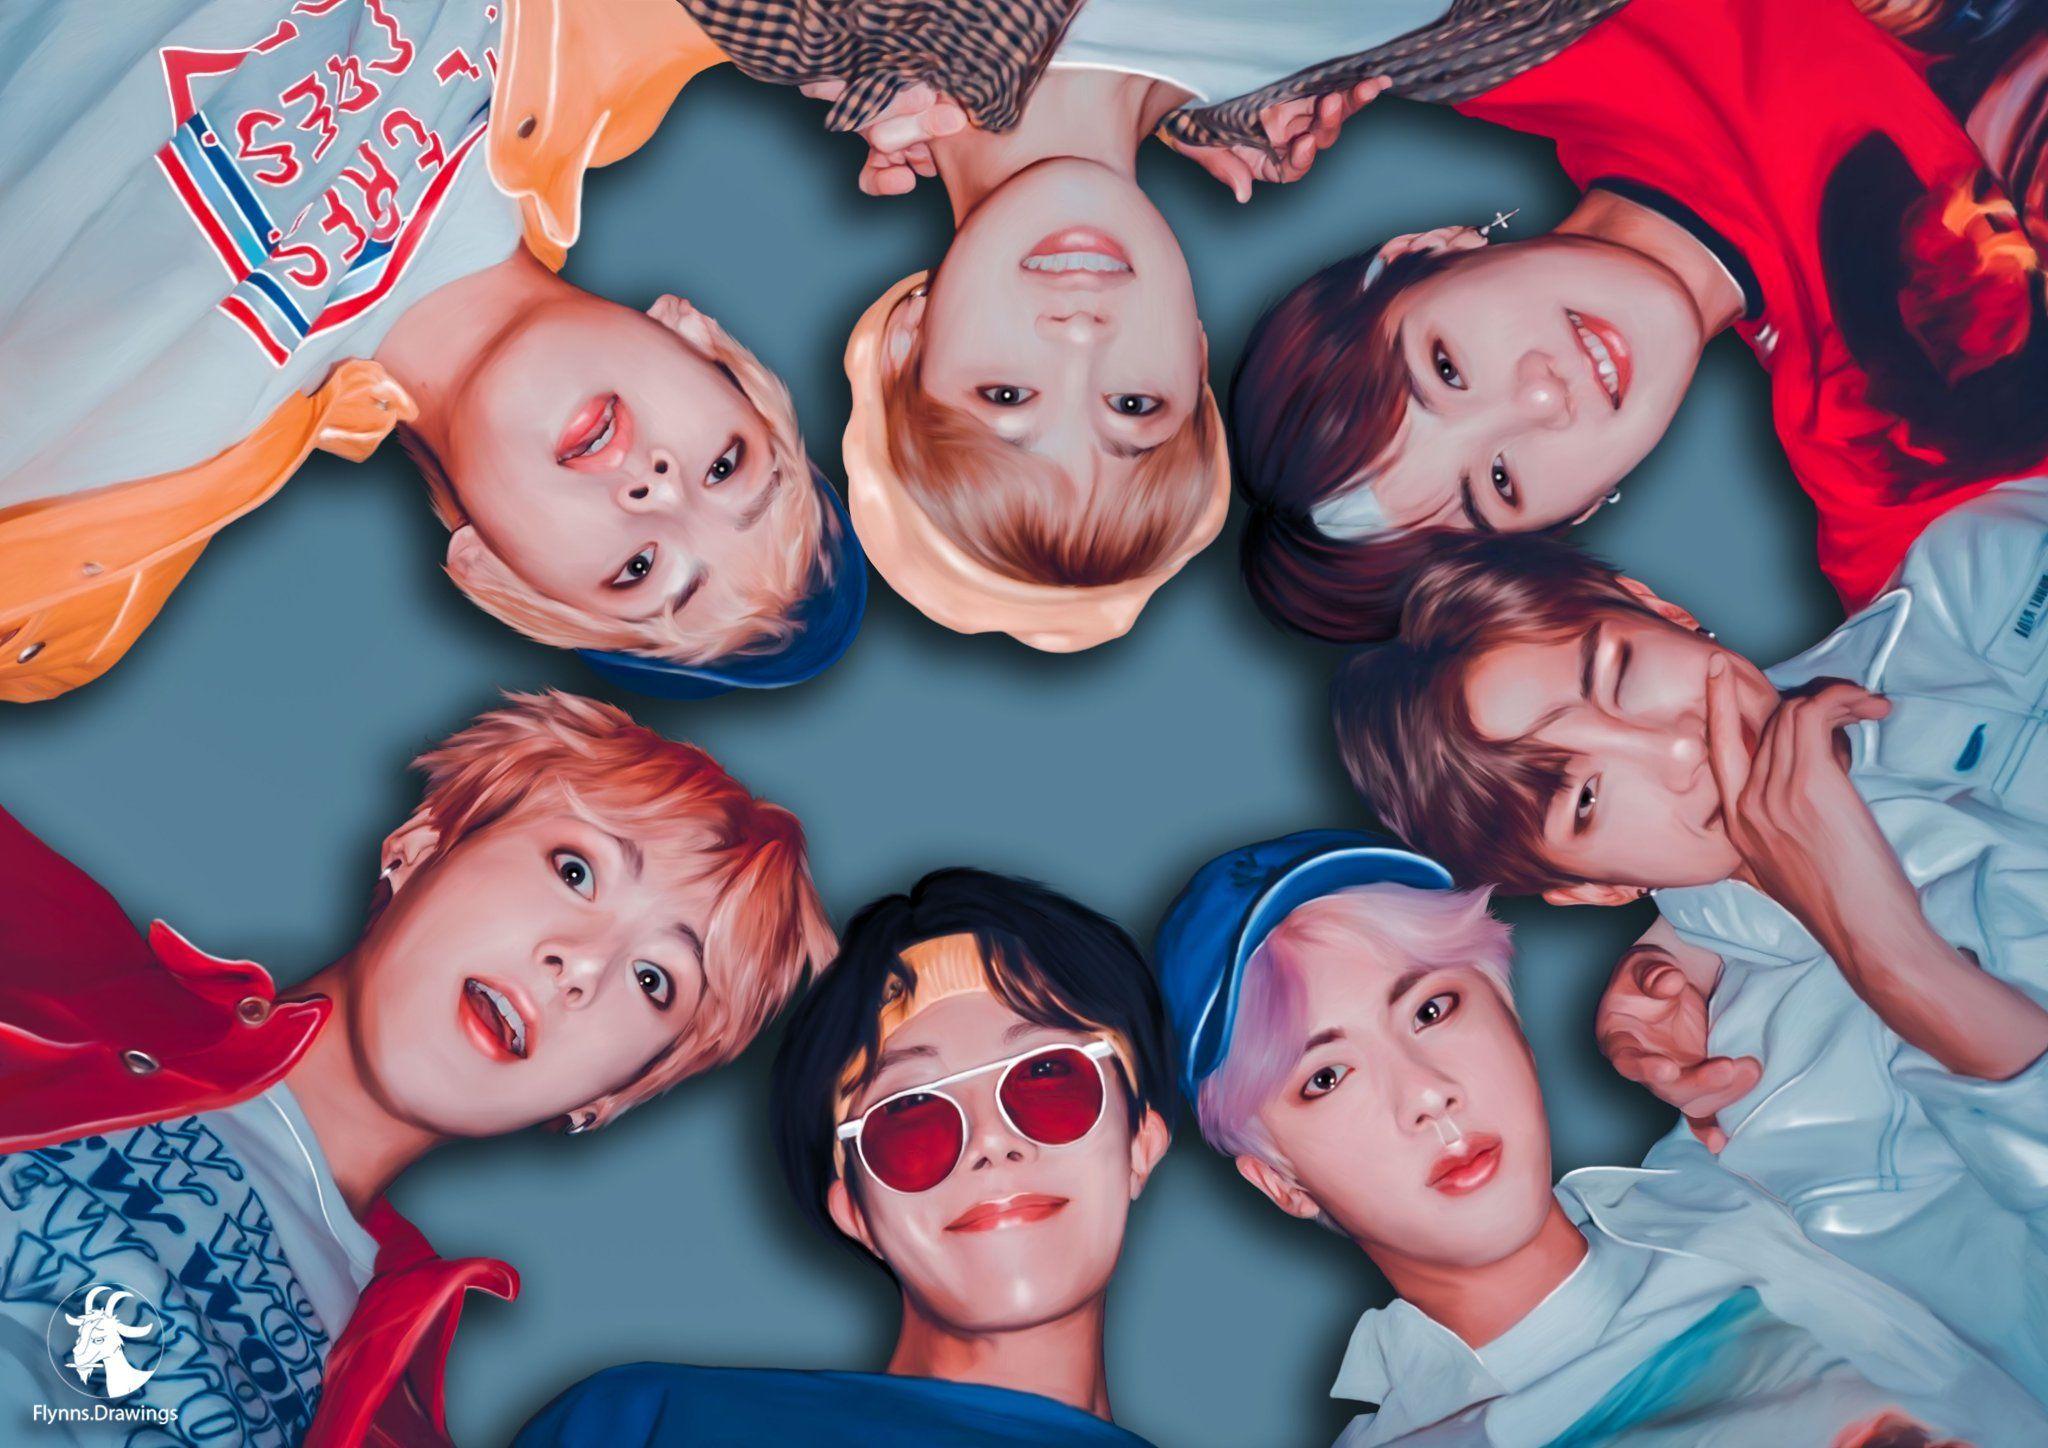 BTS Fanart Desktop Wallpapers - Wallpaper Cave